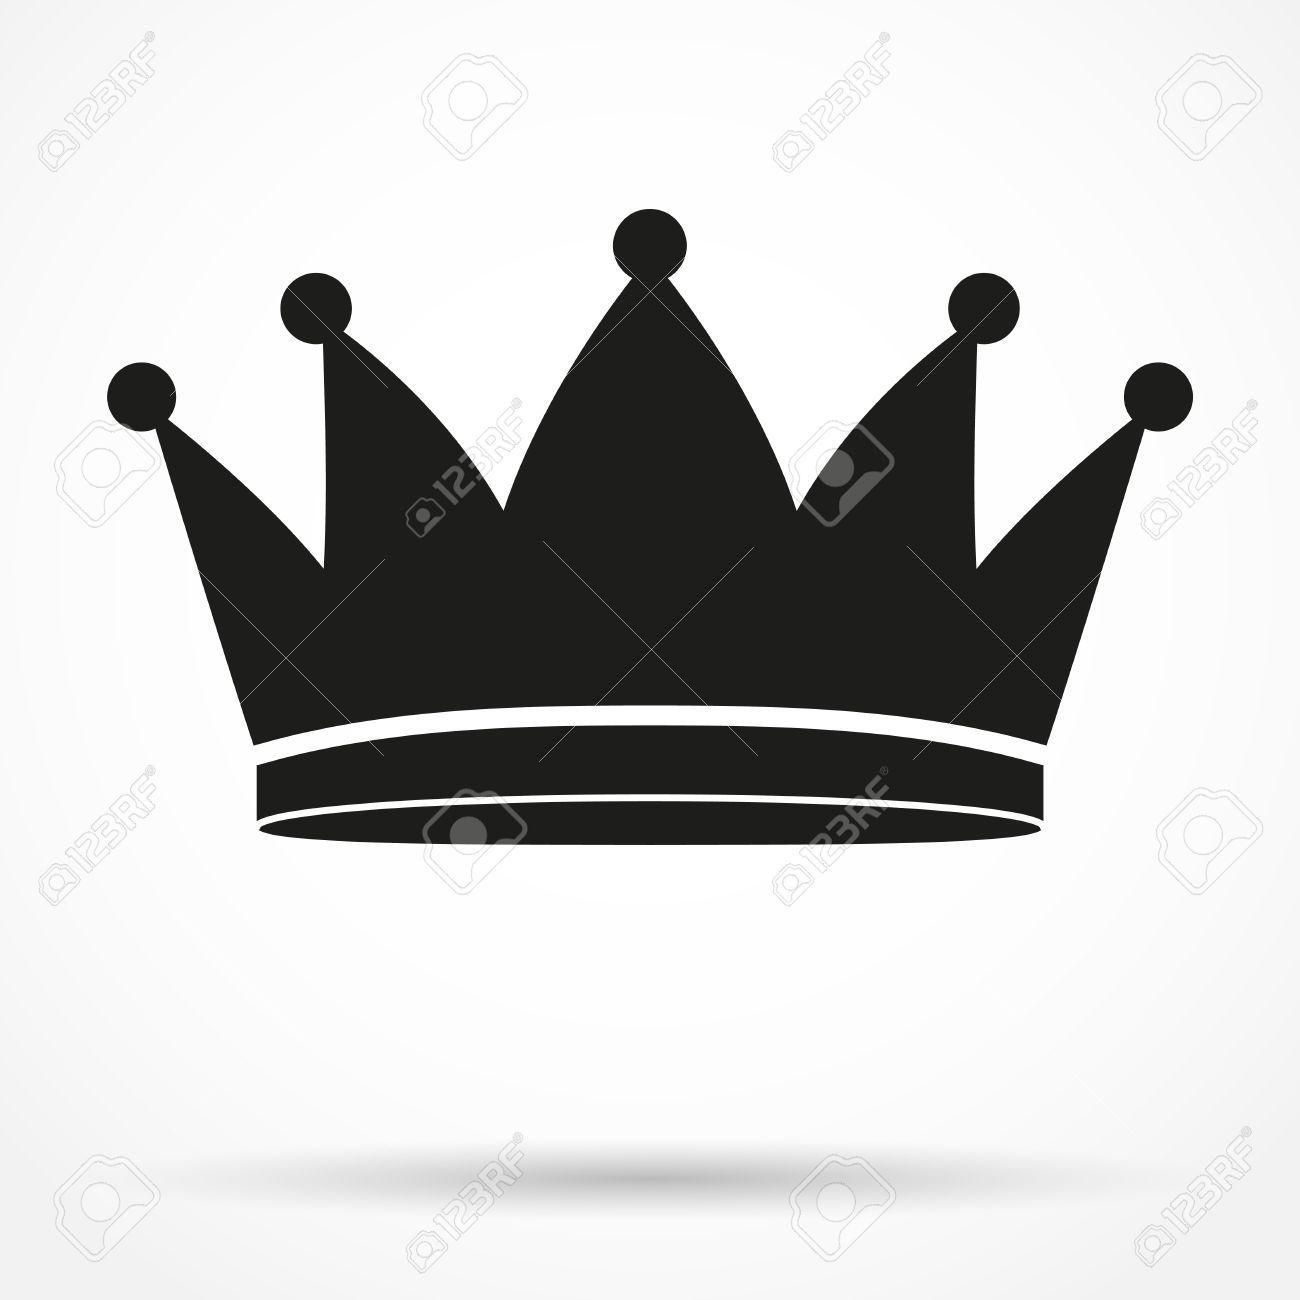 silhouette simple symbol of classic royal king crown vector rh 123rf com king crown vector art king crown vector black